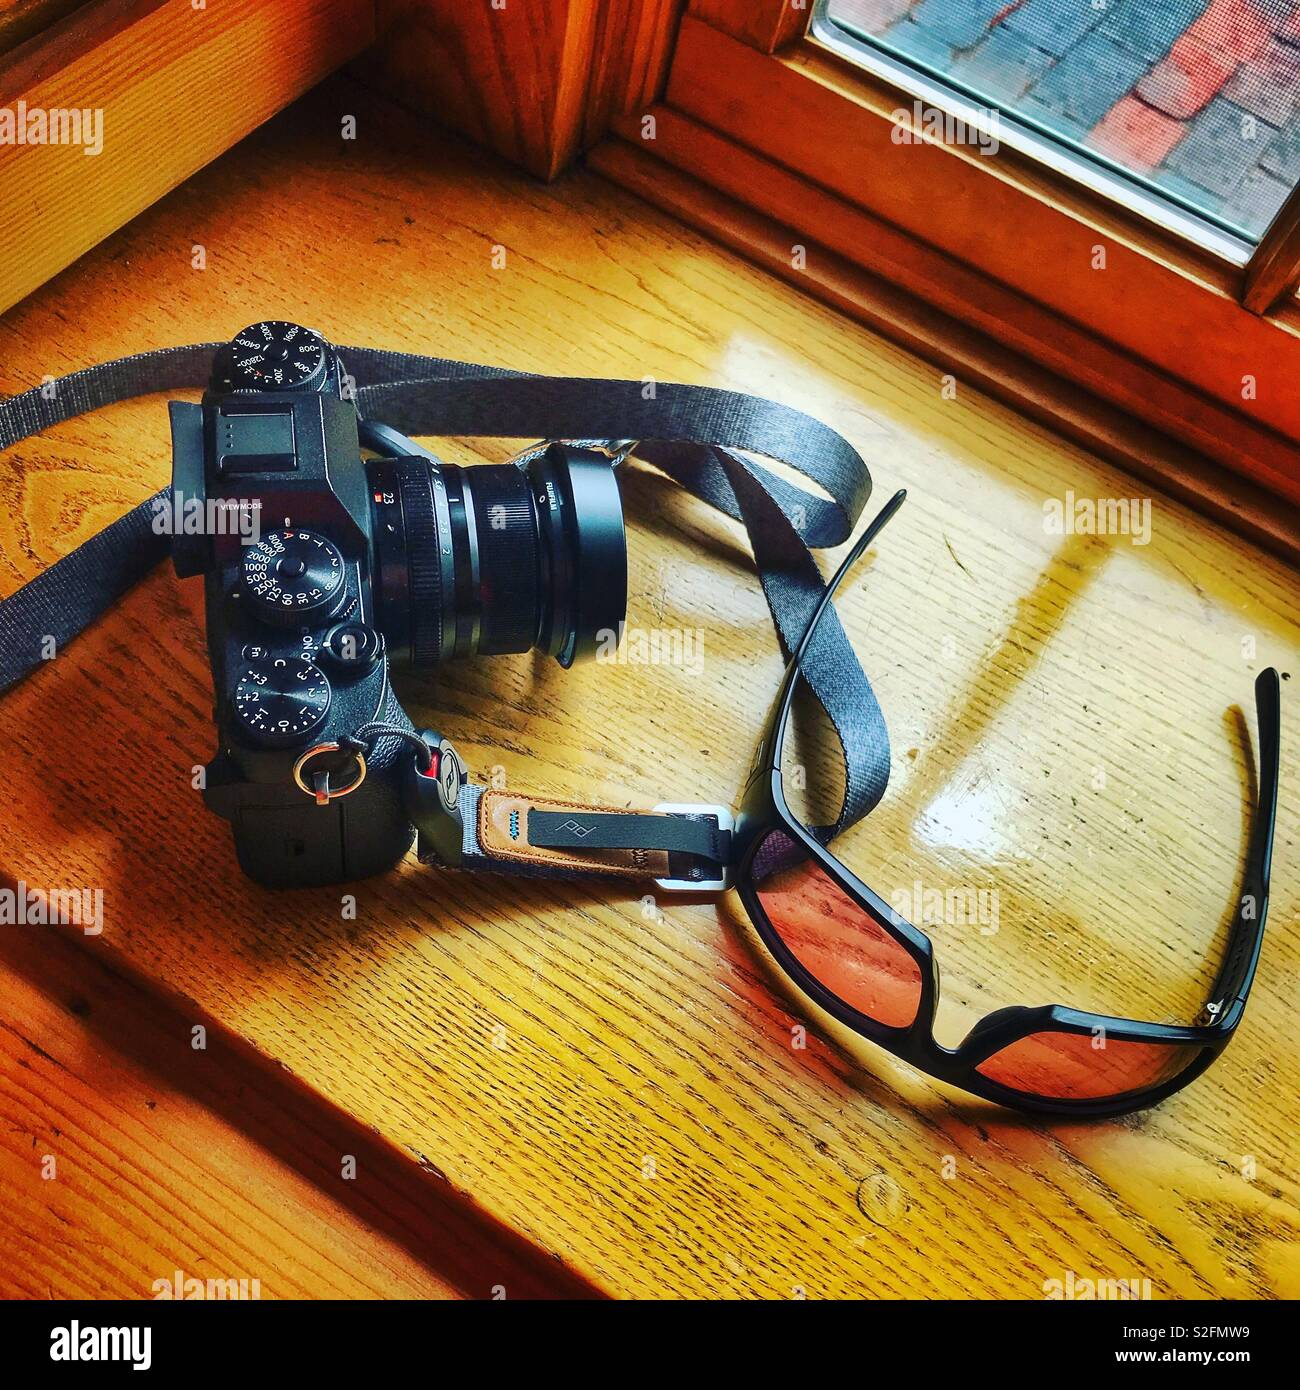 Fujifilm Xt2 with XF23mm lens and Smith sunglasses on a sunny windowsill. - Stock Image